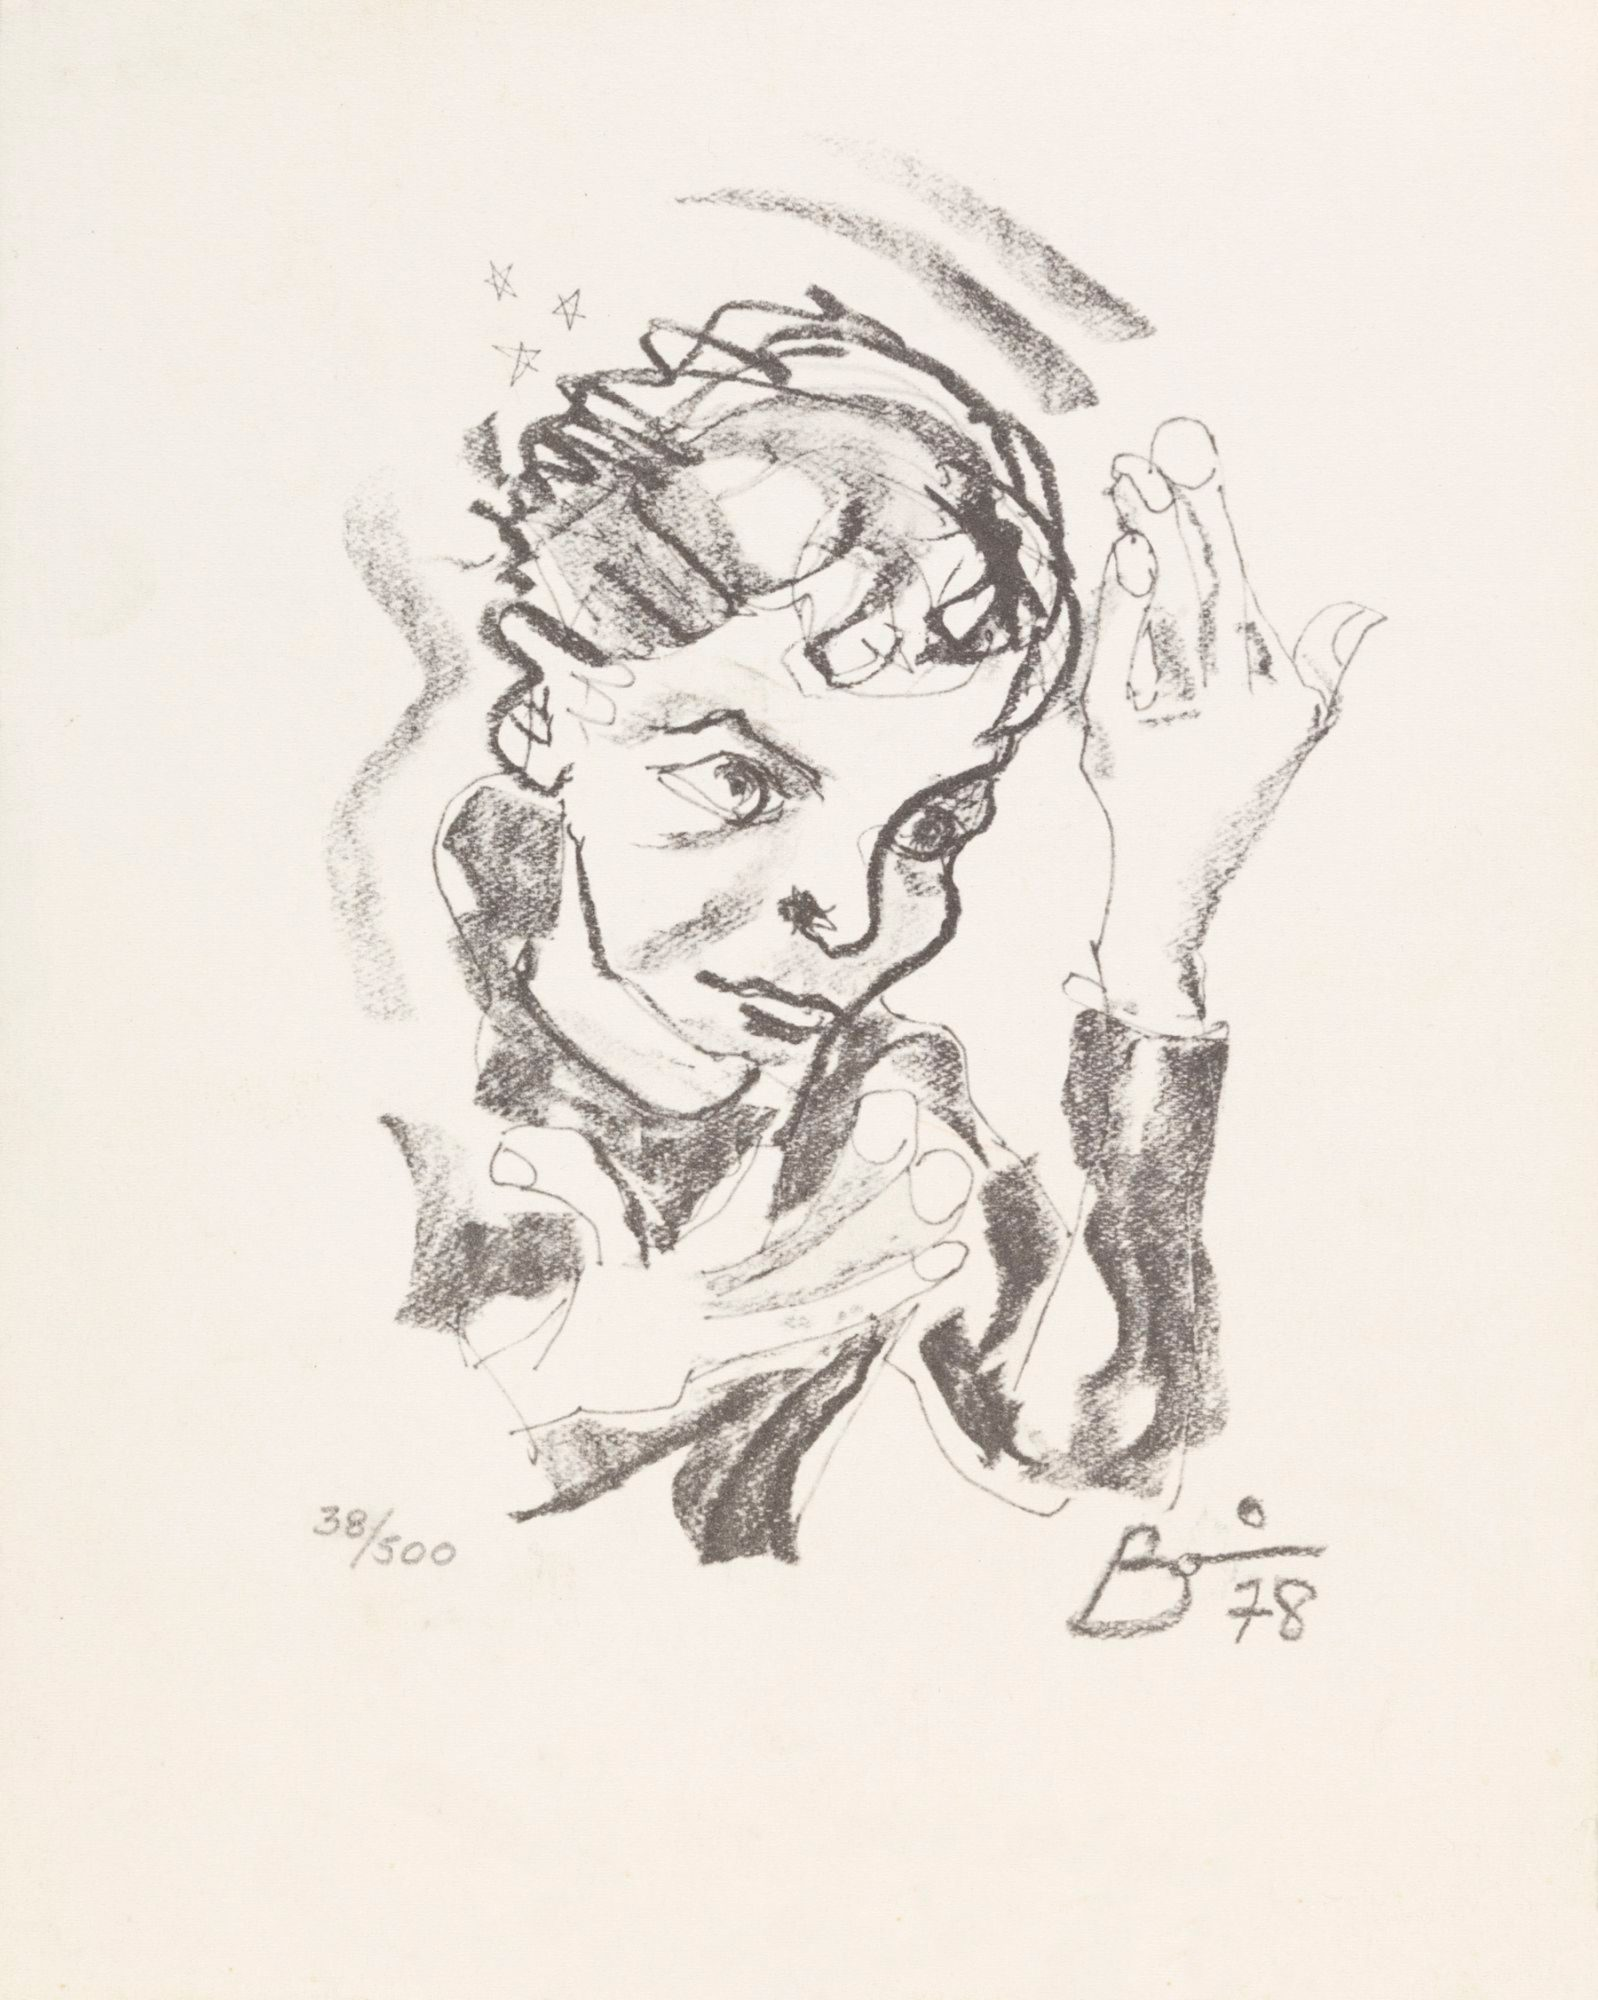 Print-after-a-self-portrait-by-David-Bowie,-1978